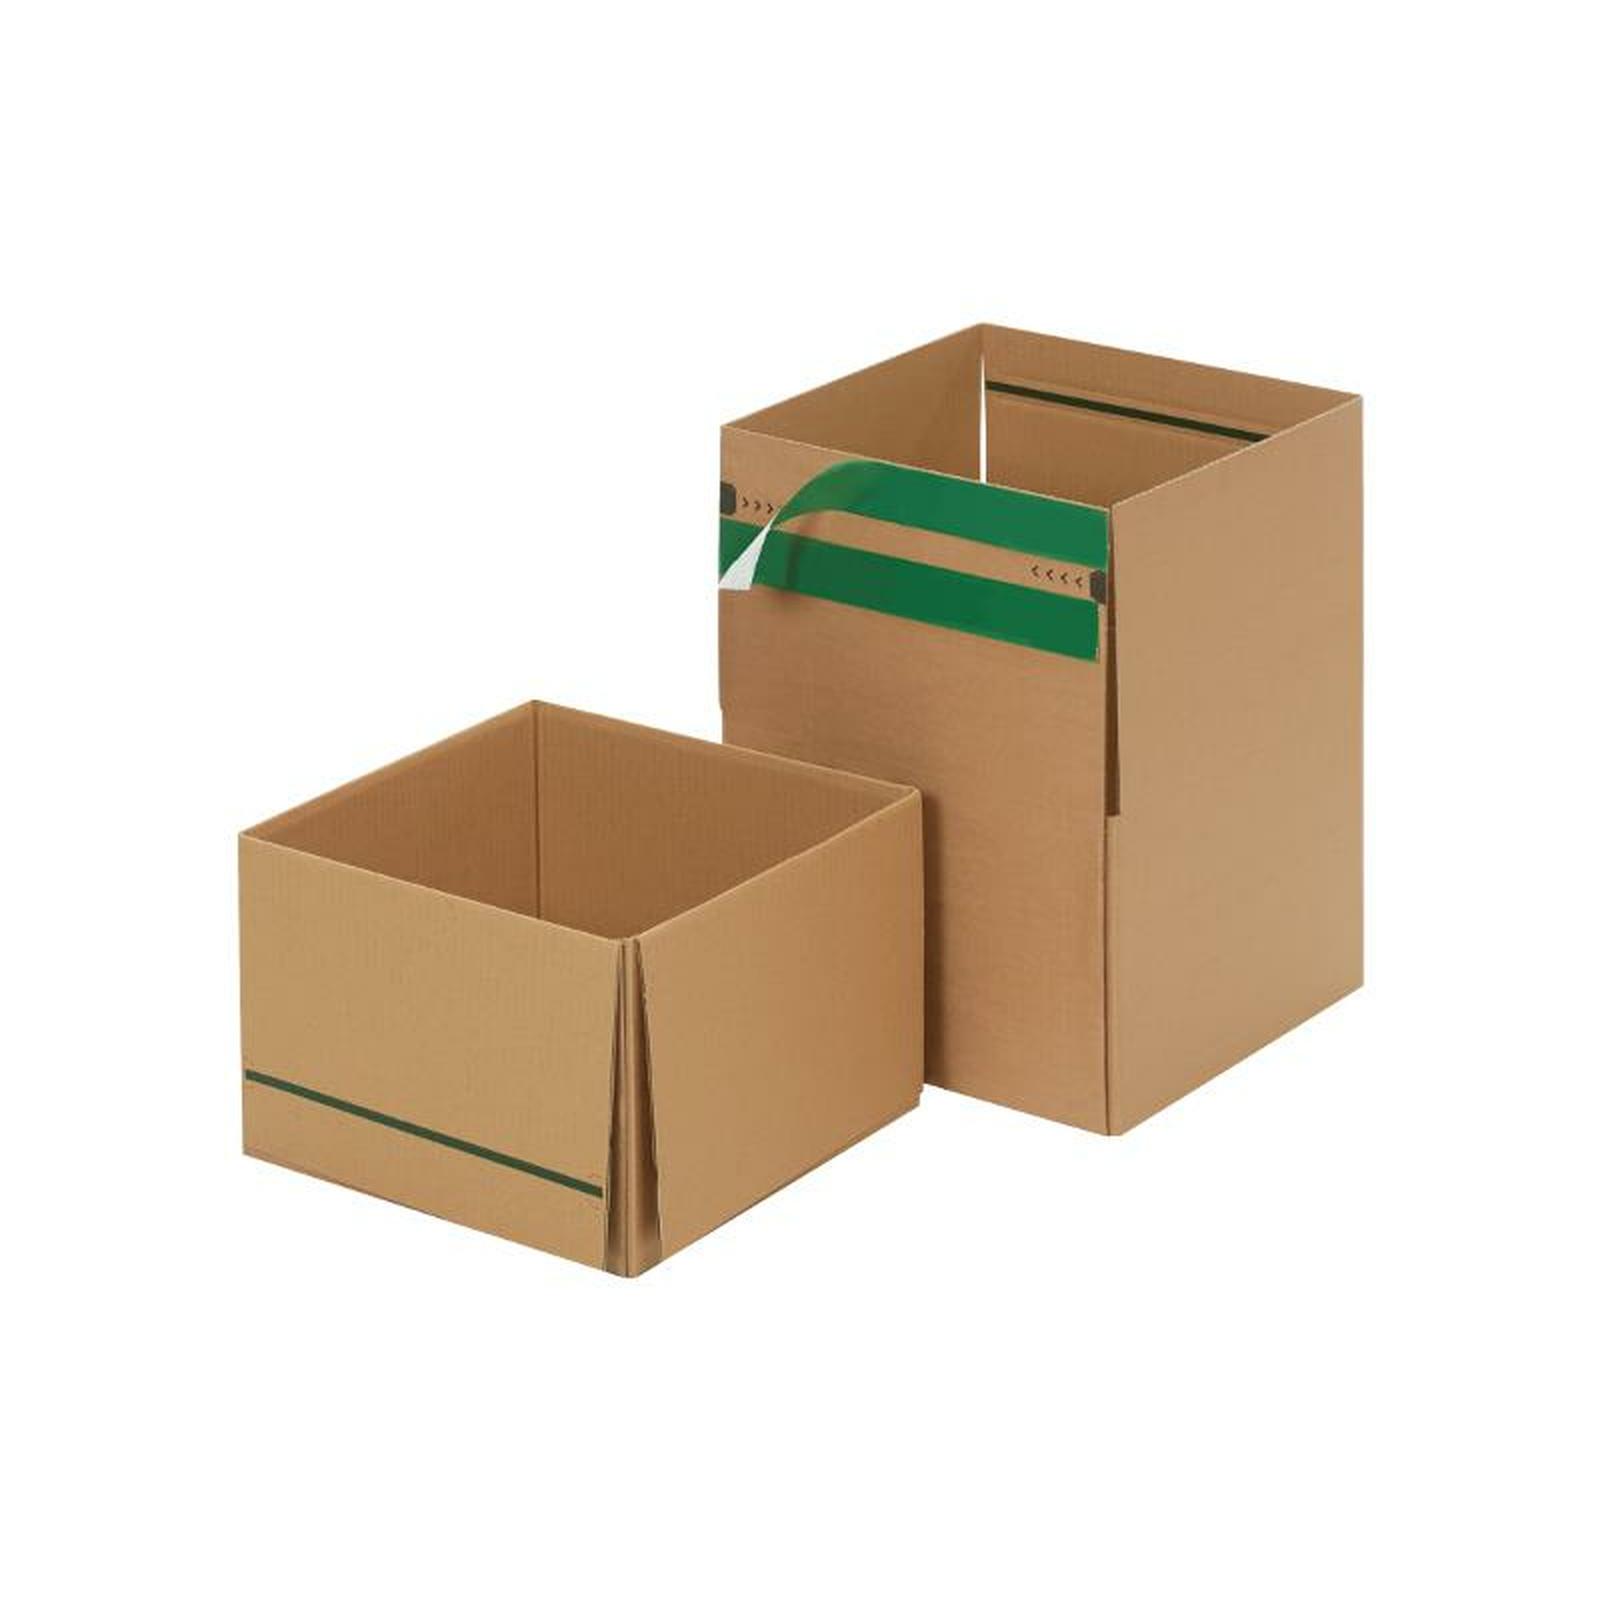 wiederverschlie bare kartons 284x284x167 mm g nstig kaufen 0 74. Black Bedroom Furniture Sets. Home Design Ideas